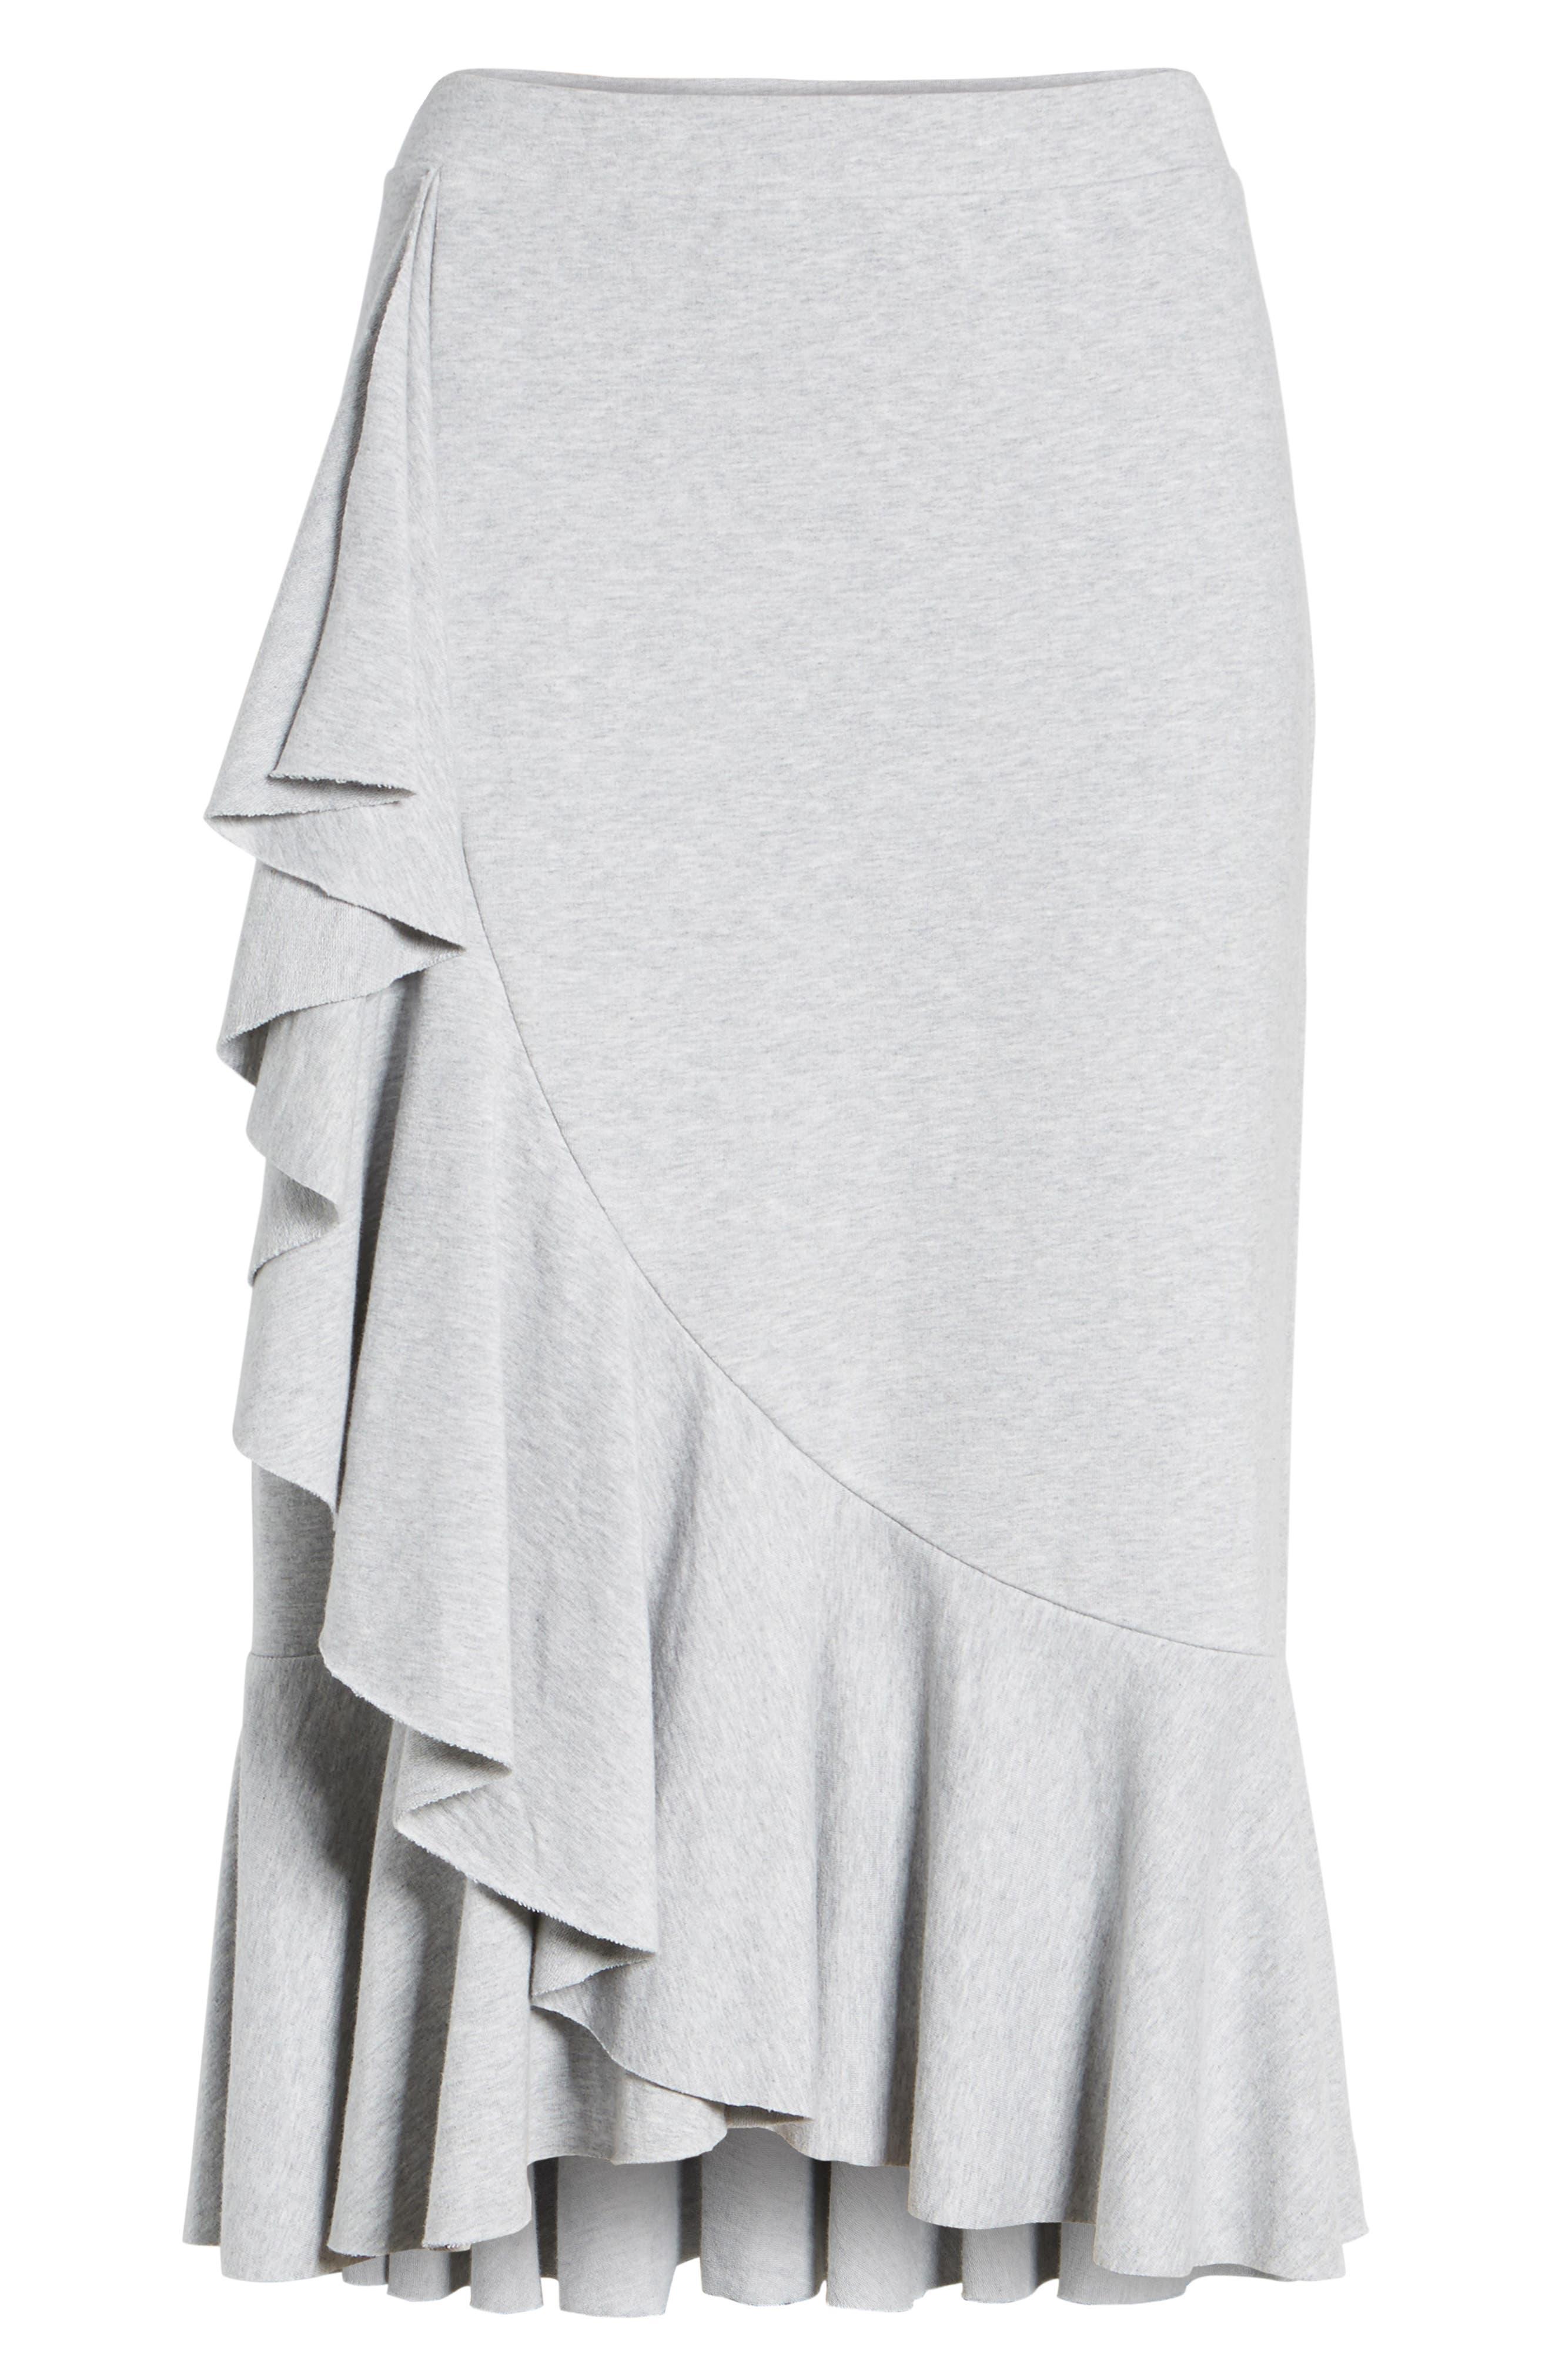 Ruffled Knit Skirt,                             Main thumbnail 1, color,                             Heather Grey